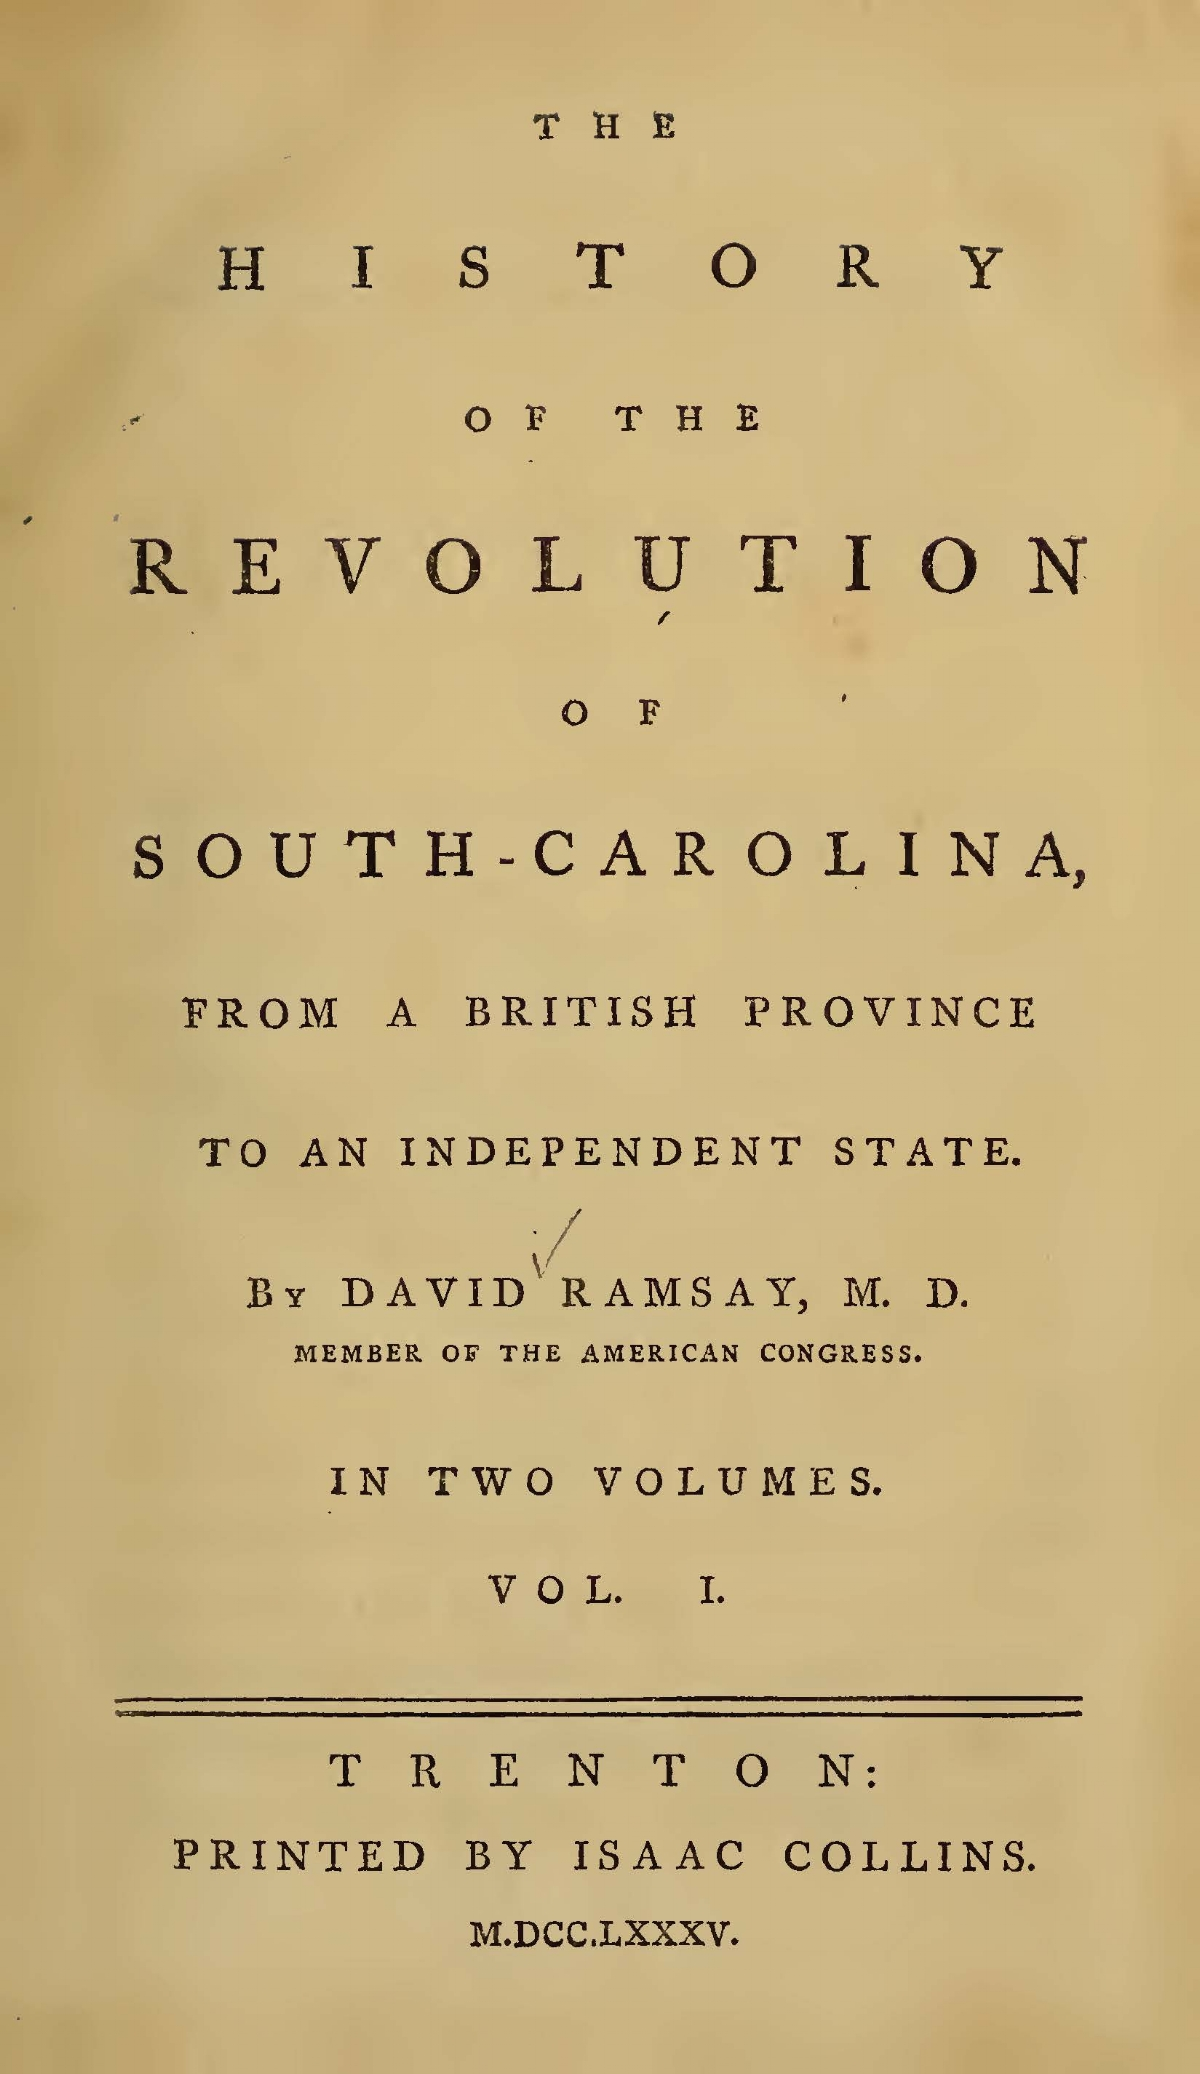 Ramsay, David, The History of the Revolution of South Carolina, Vol. 1 Title Page.jpg